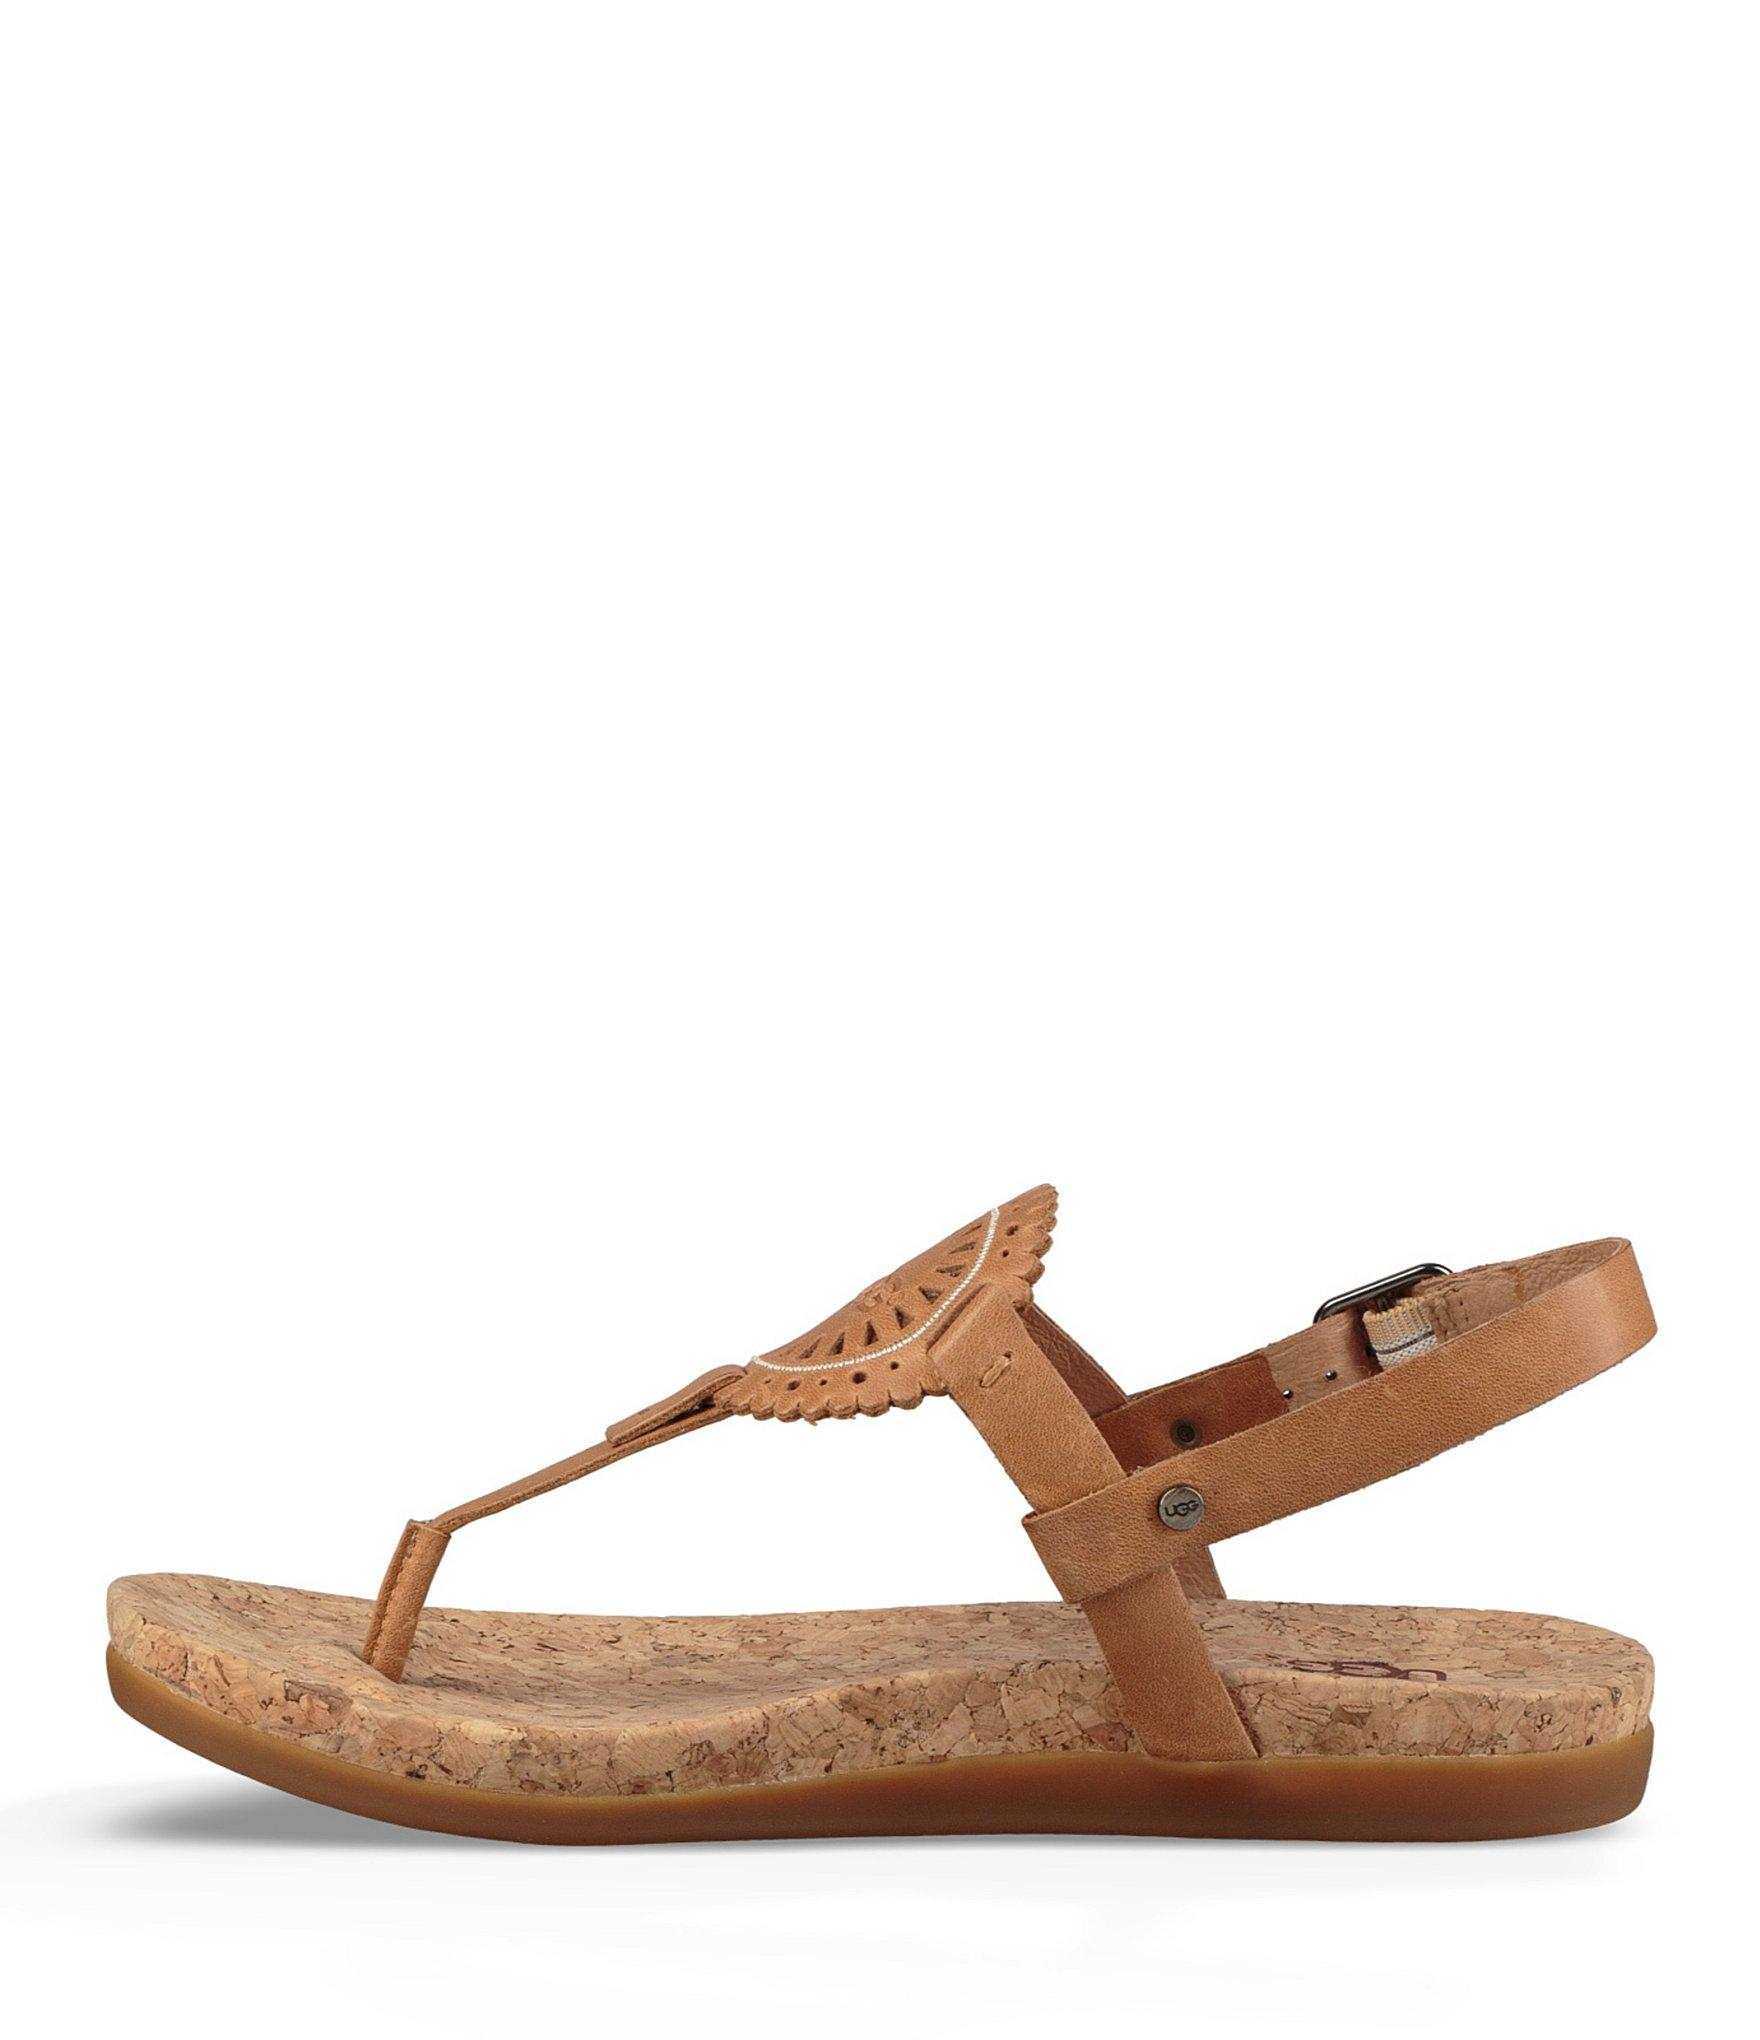 602a0769f0c3f Ugg - Brown Ayden Ii Leather   Cork Thong Sandals - Lyst. View fullscreen